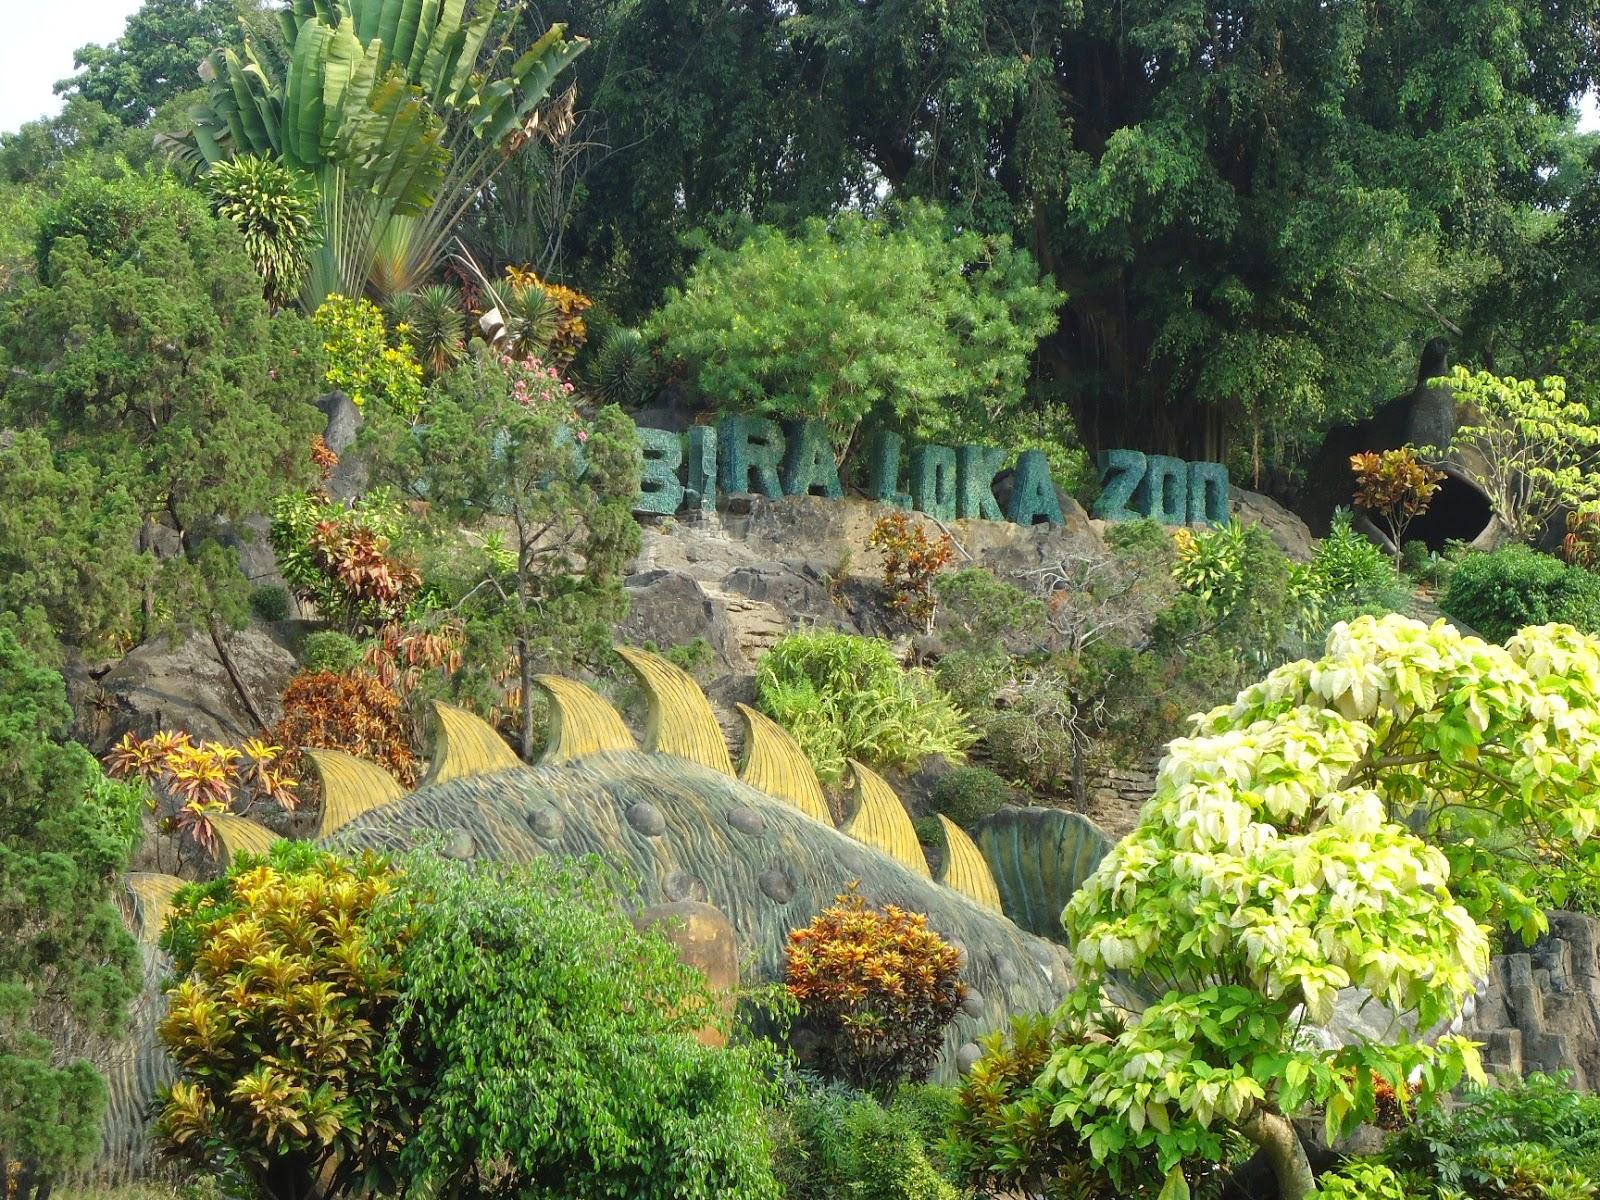 Gembira Loka Zoo Liburan Asik Bersama Kecil Yogyakarta Bonbin Kota